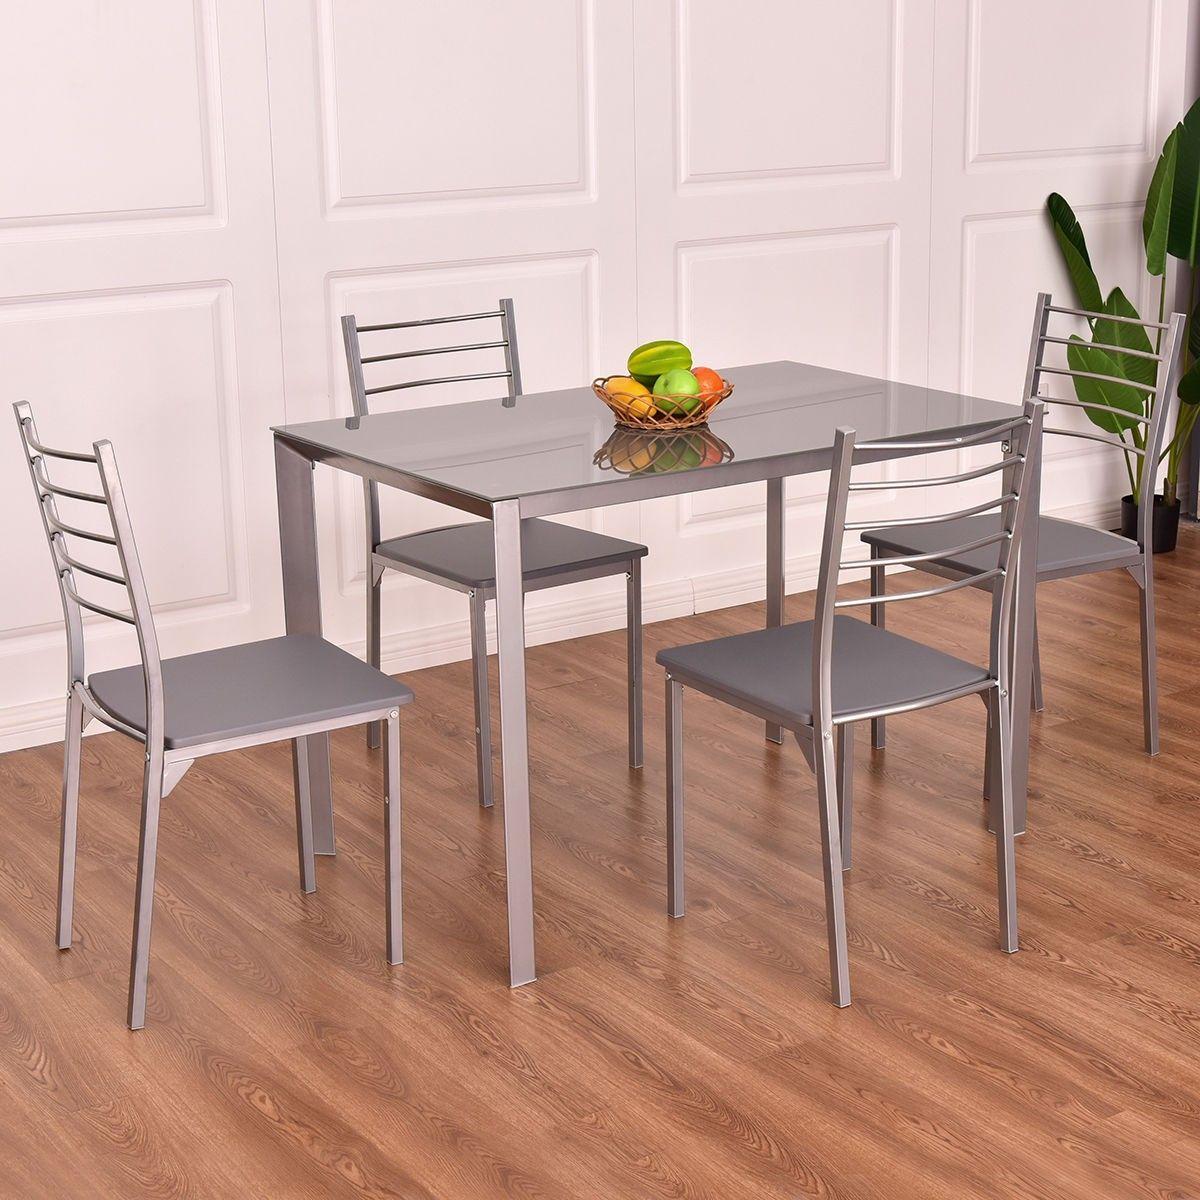 5 pcs Tempered Glass Dining Furniture Set Dining